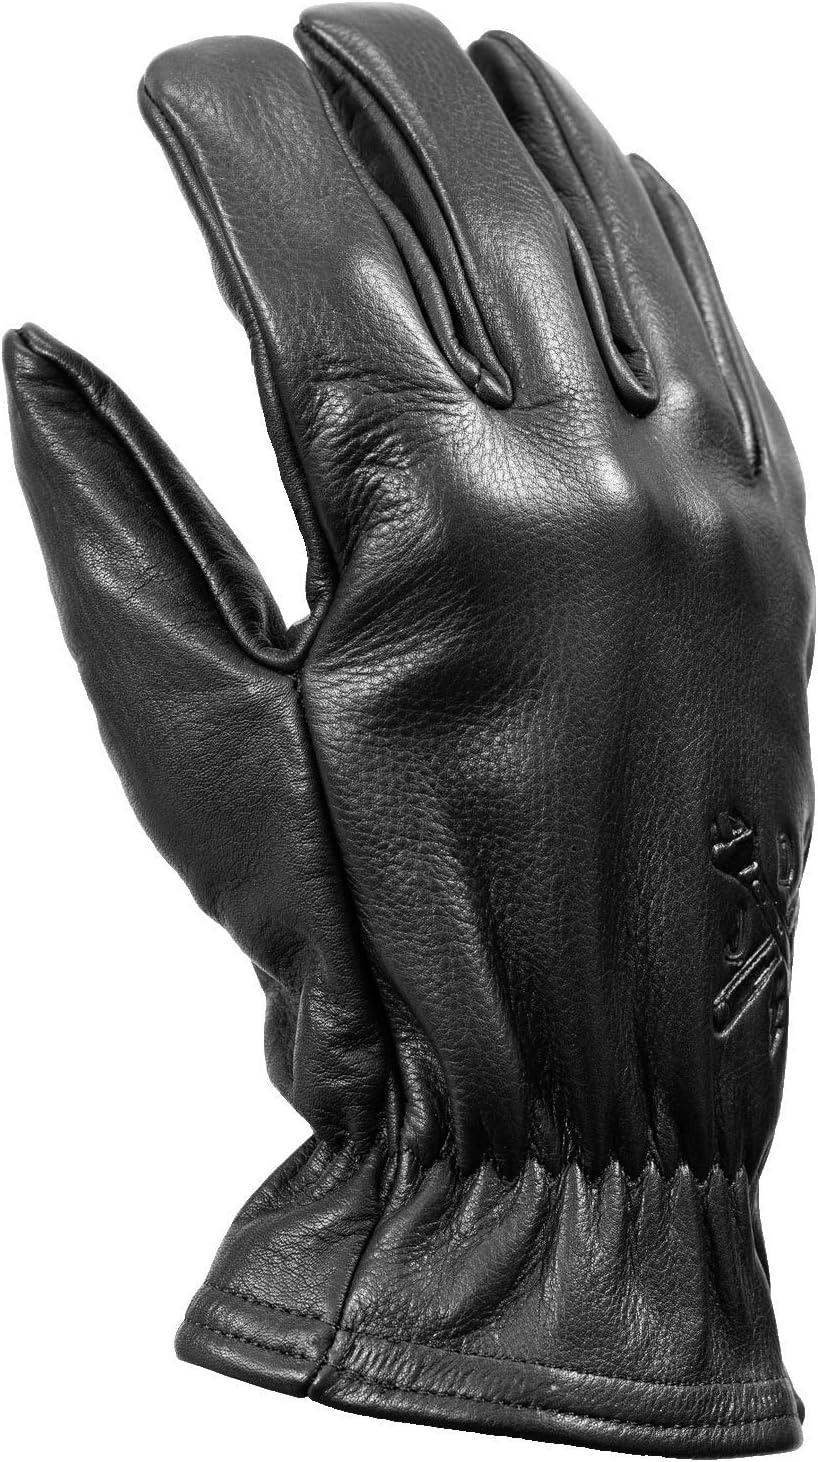 John Doe Motorrad Handschuh Freewheeler Innenseite Handschuh Aus Rindsleder Atmungsaktiv Auto